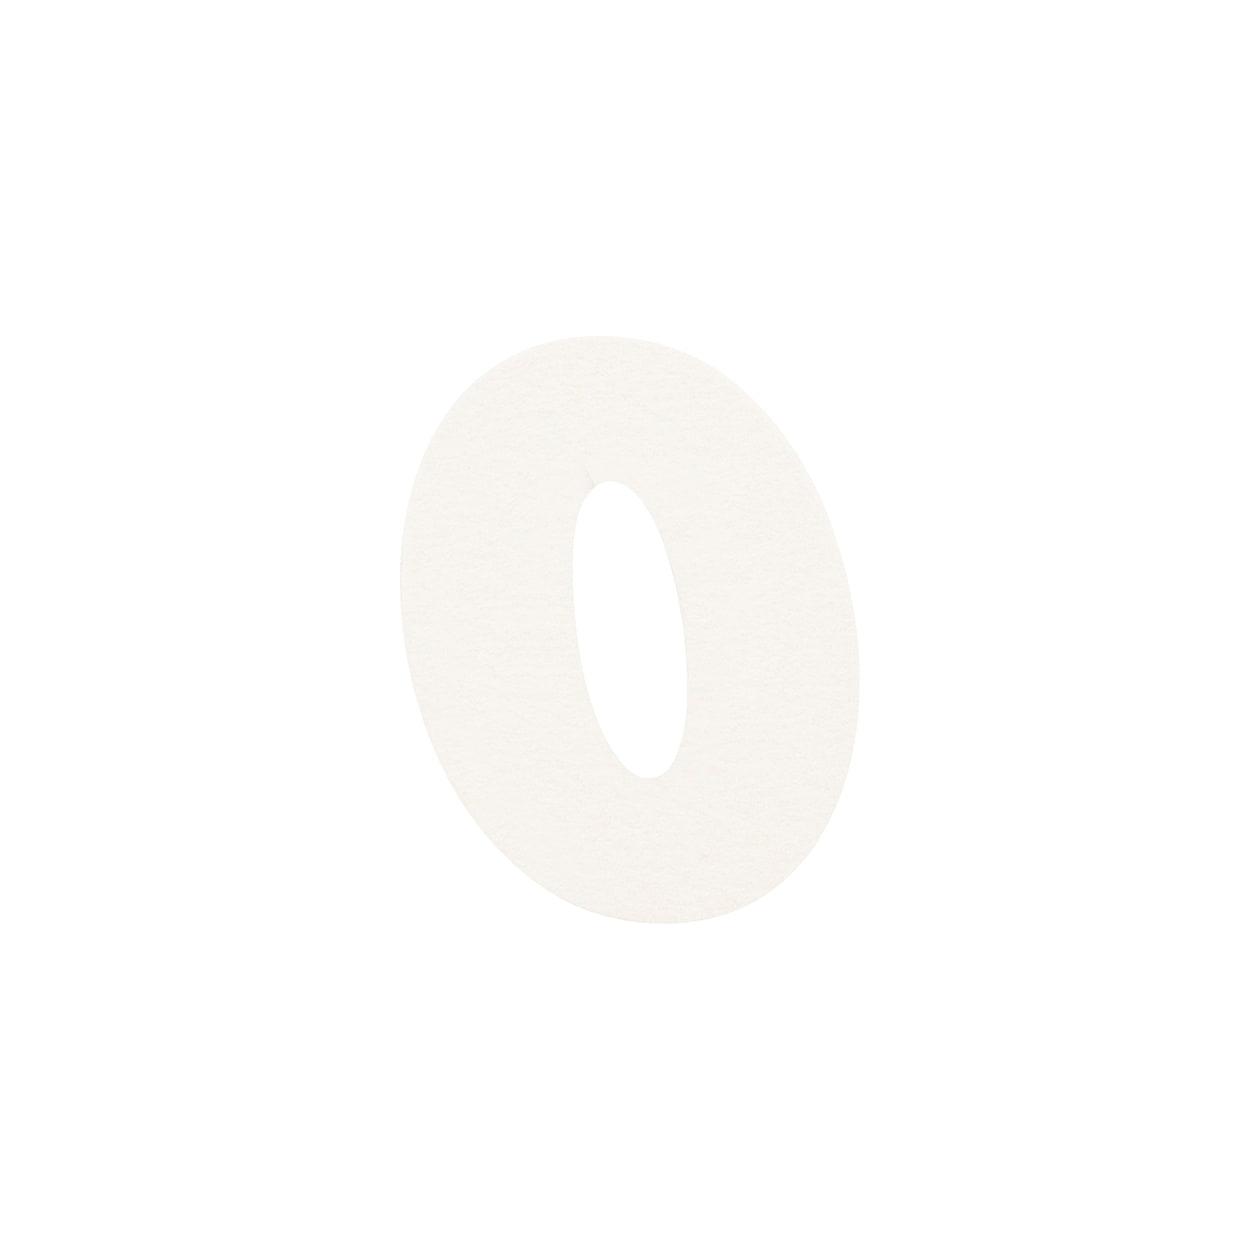 No.395ボード ネームカードDC 数字0 シルバー